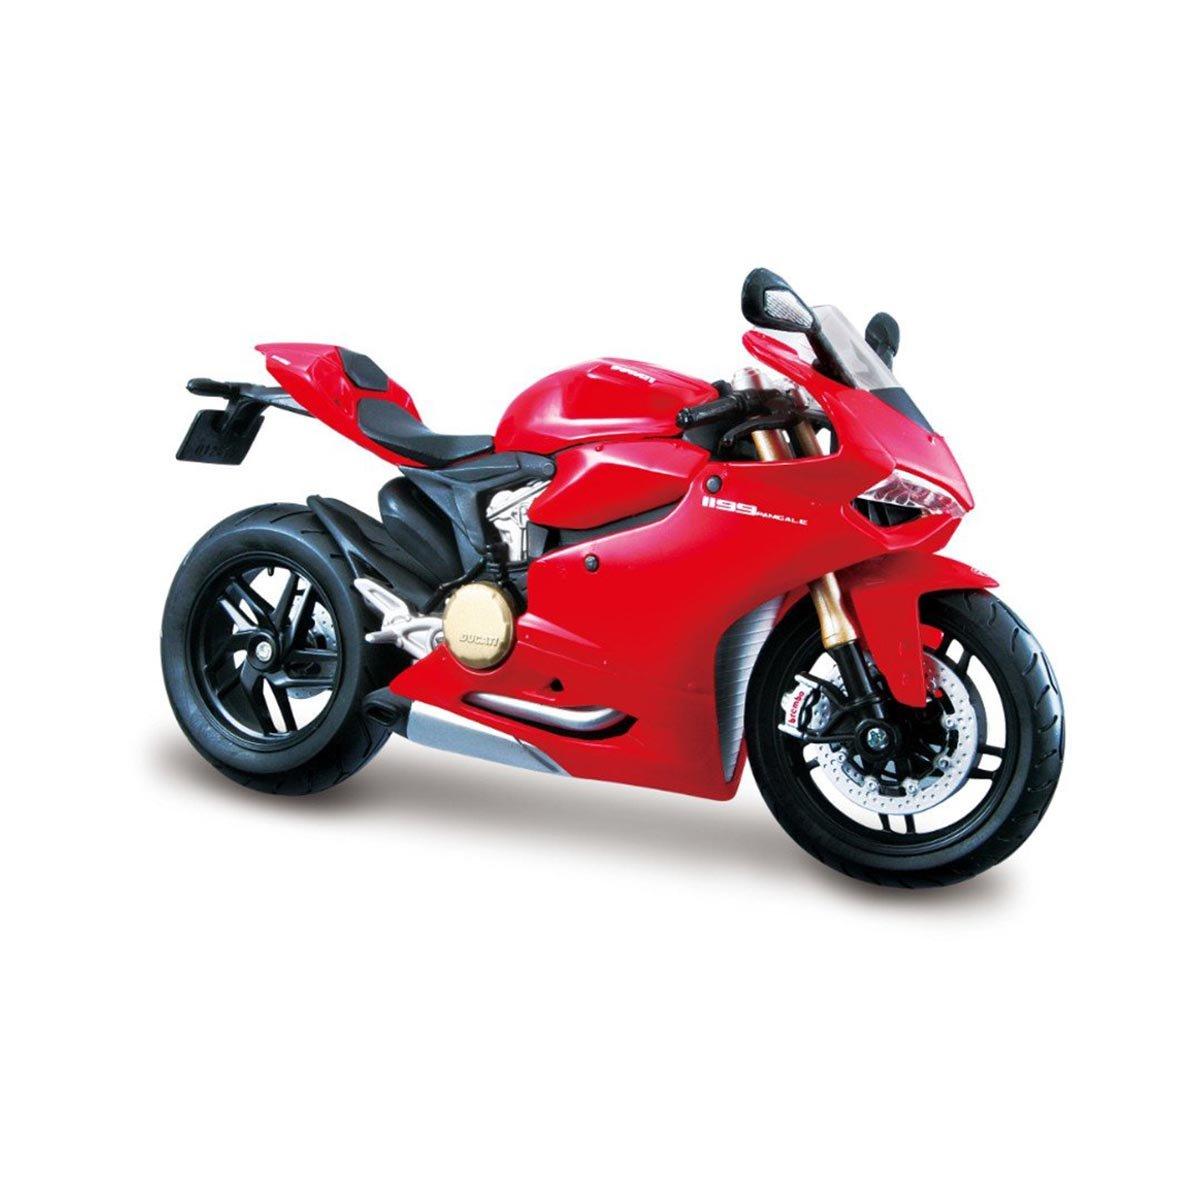 Motocicleta Maisto Ducati 1199, 1:12